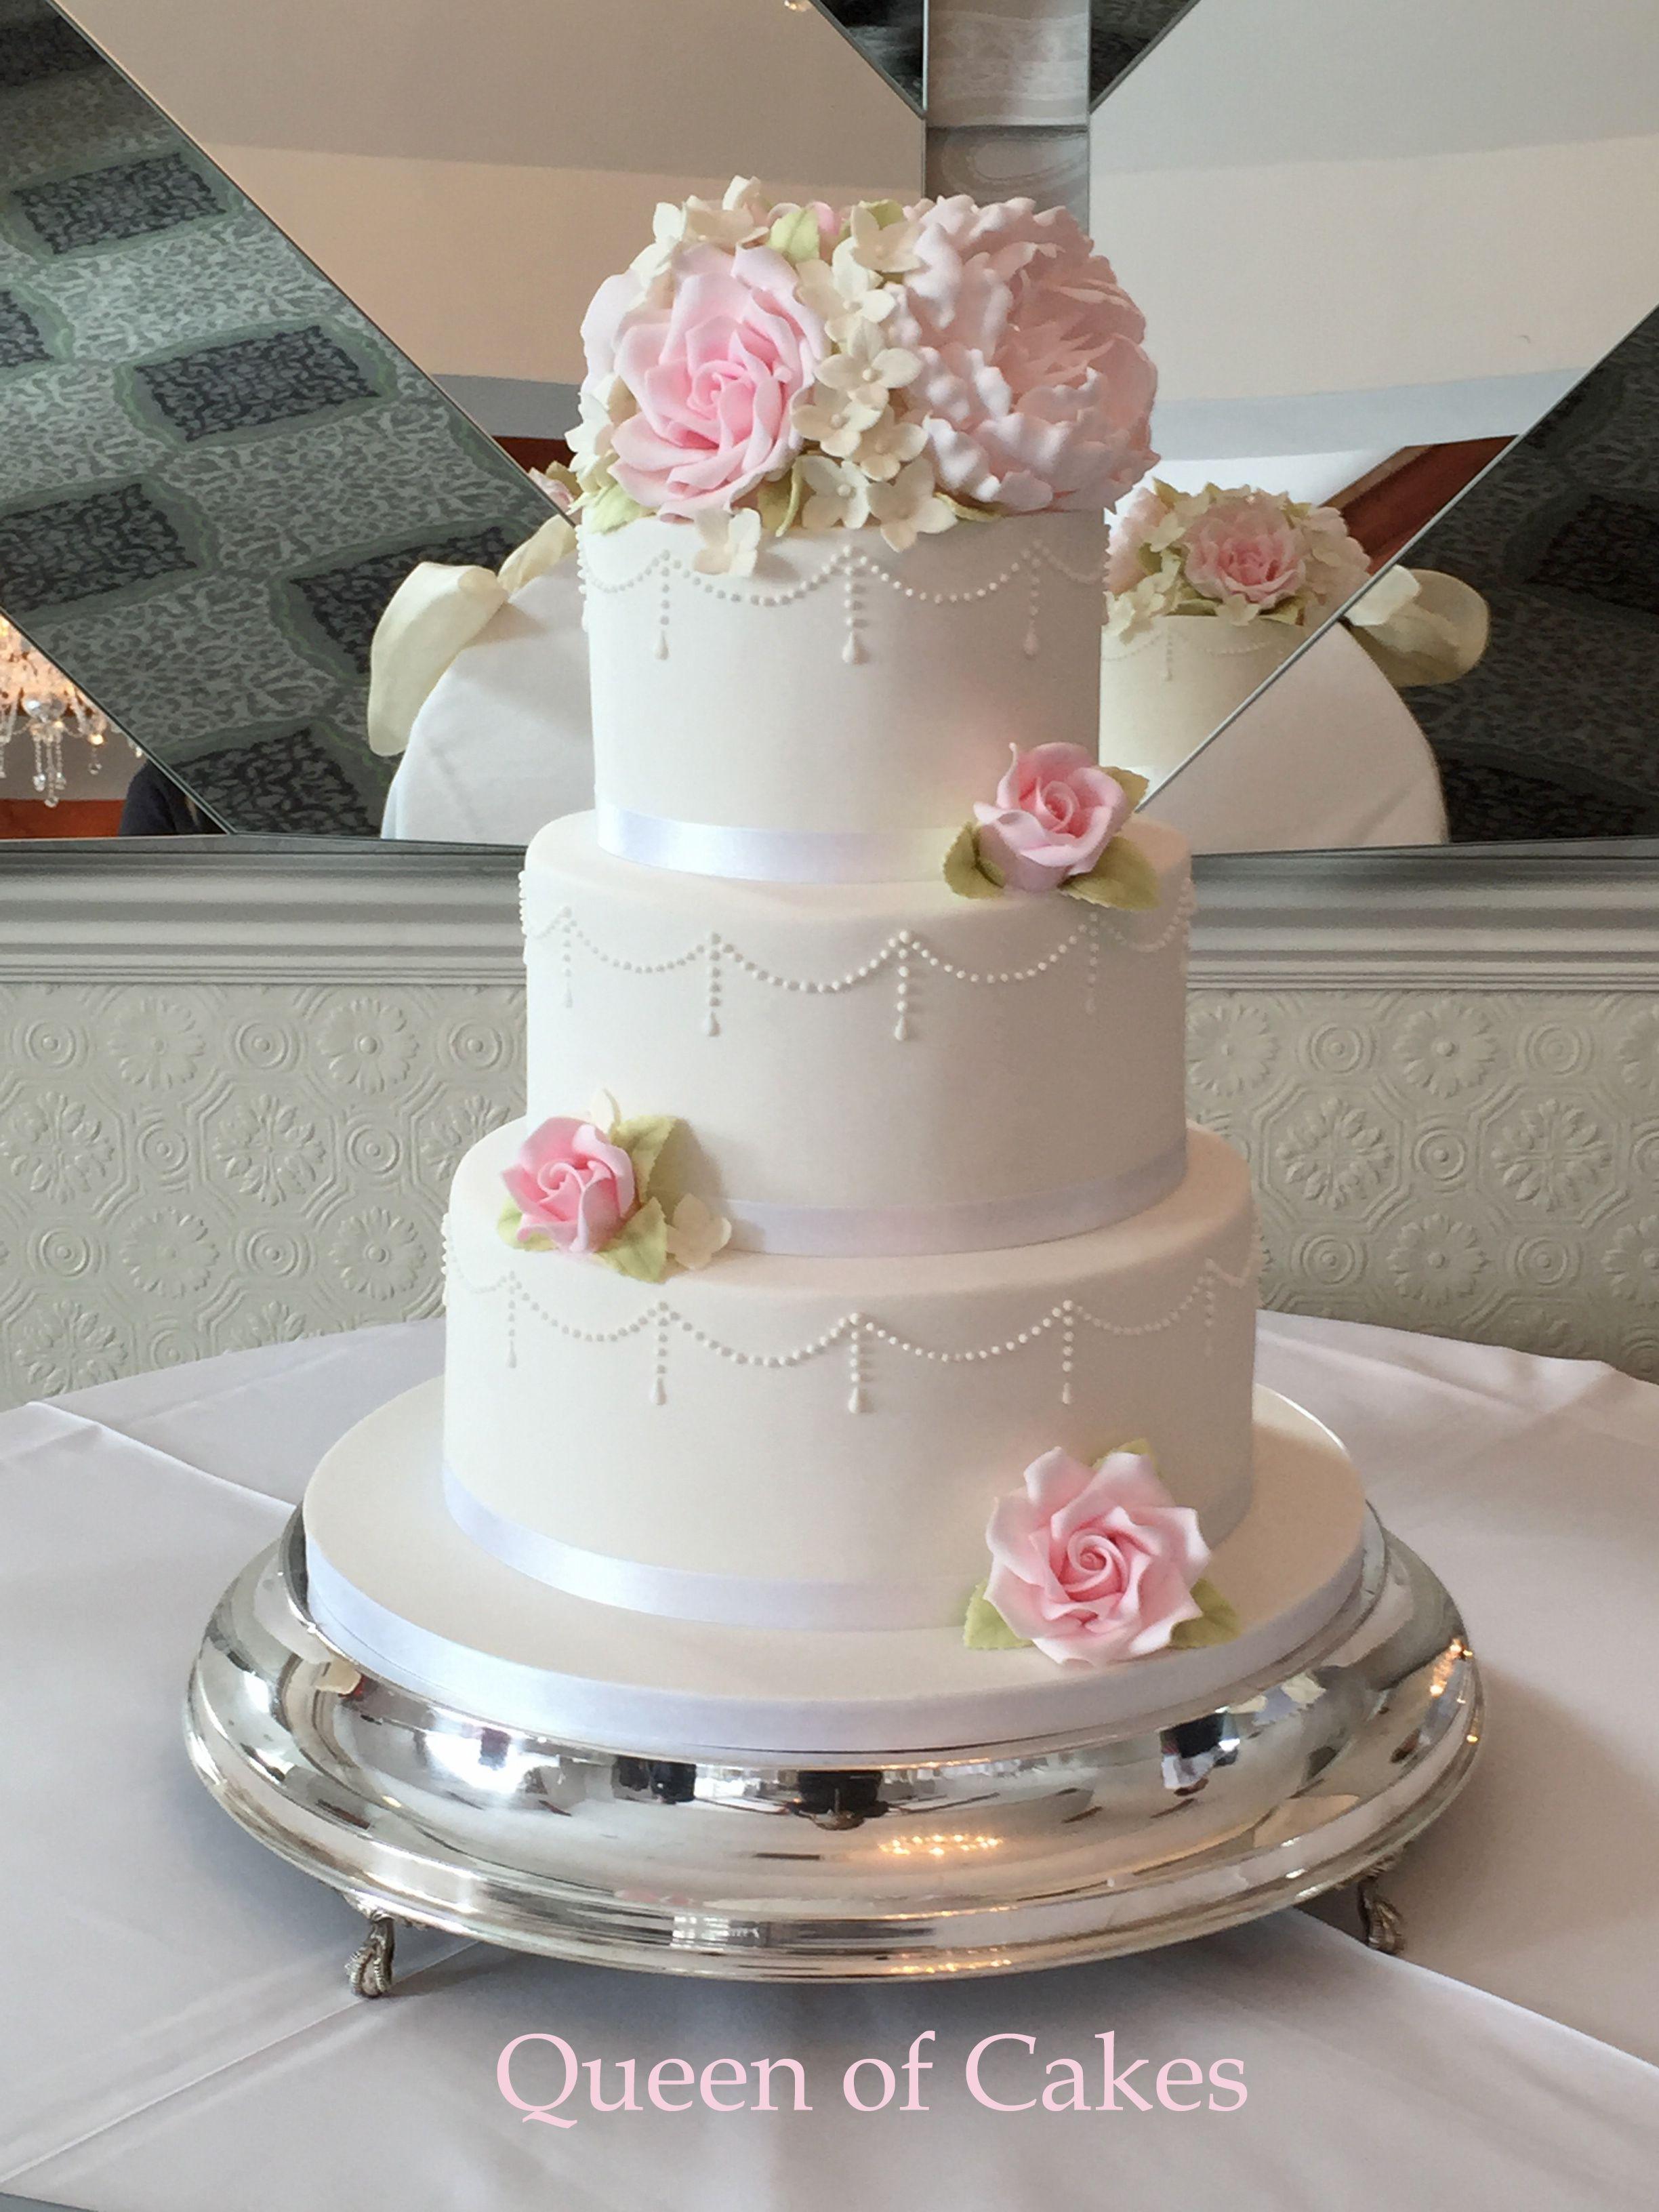 Spring bloom wedding cake by queen of cakes sugar peonies roses